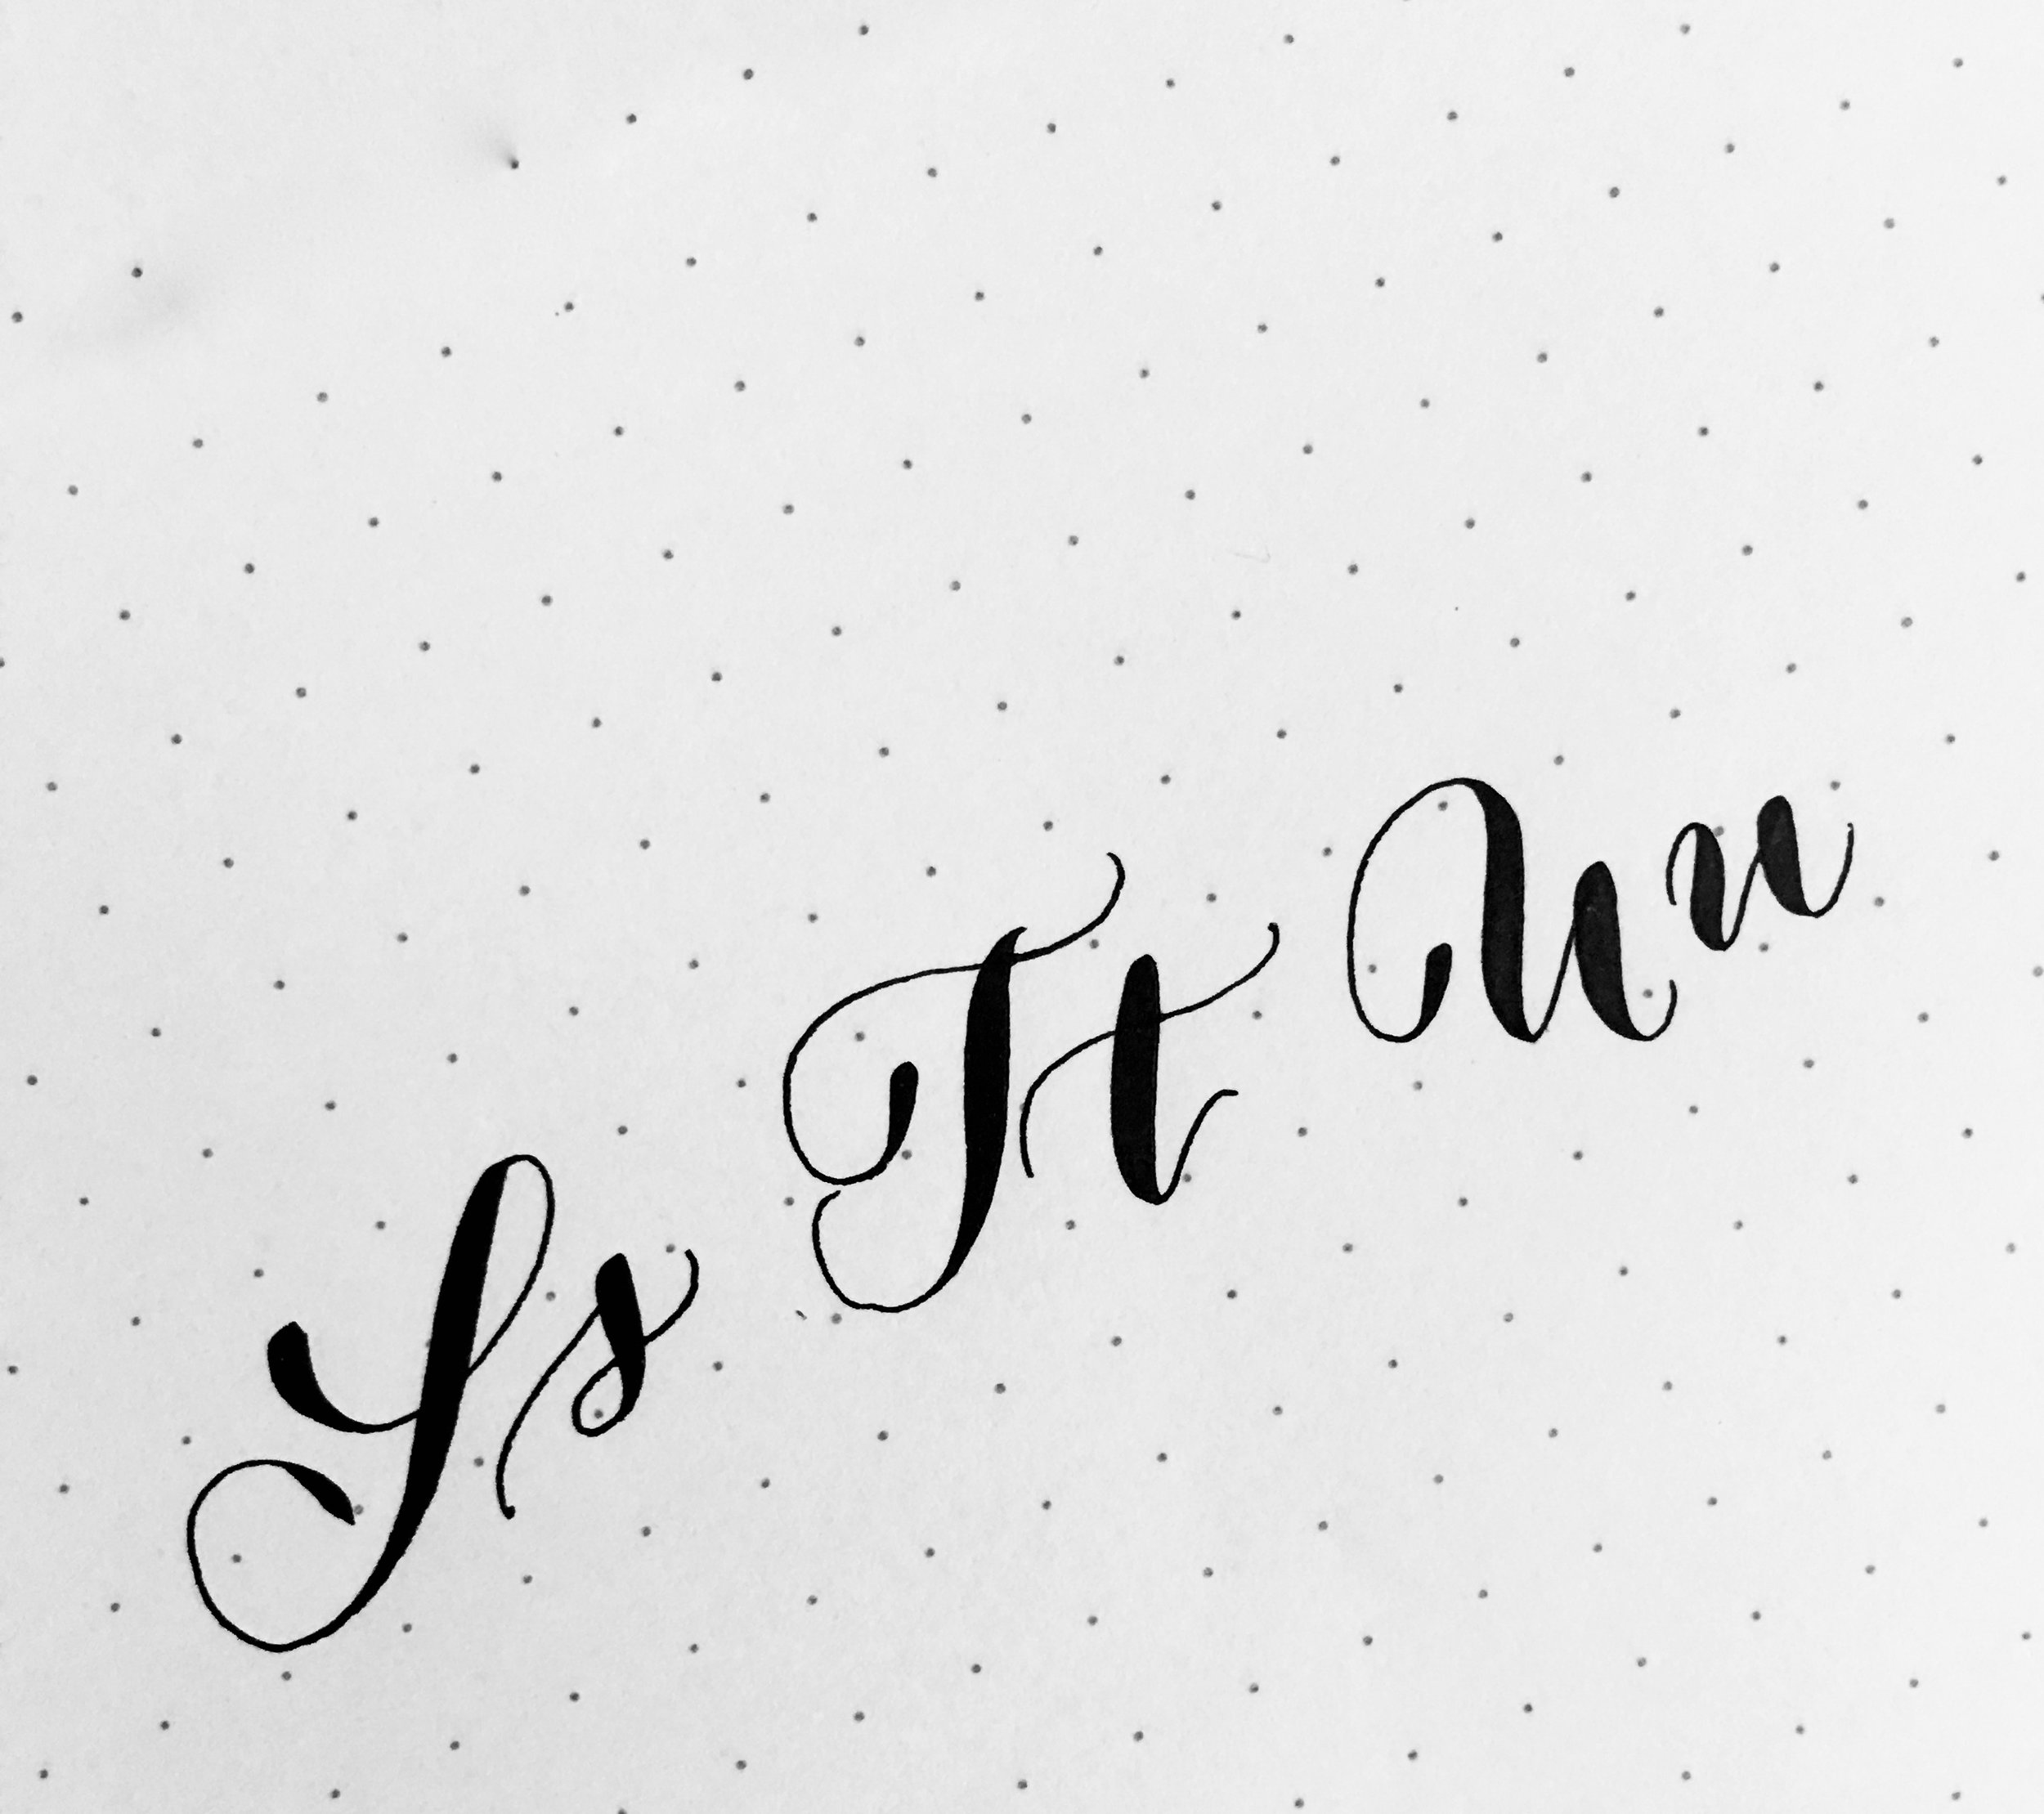 calligraphy_S_through_u.jpg